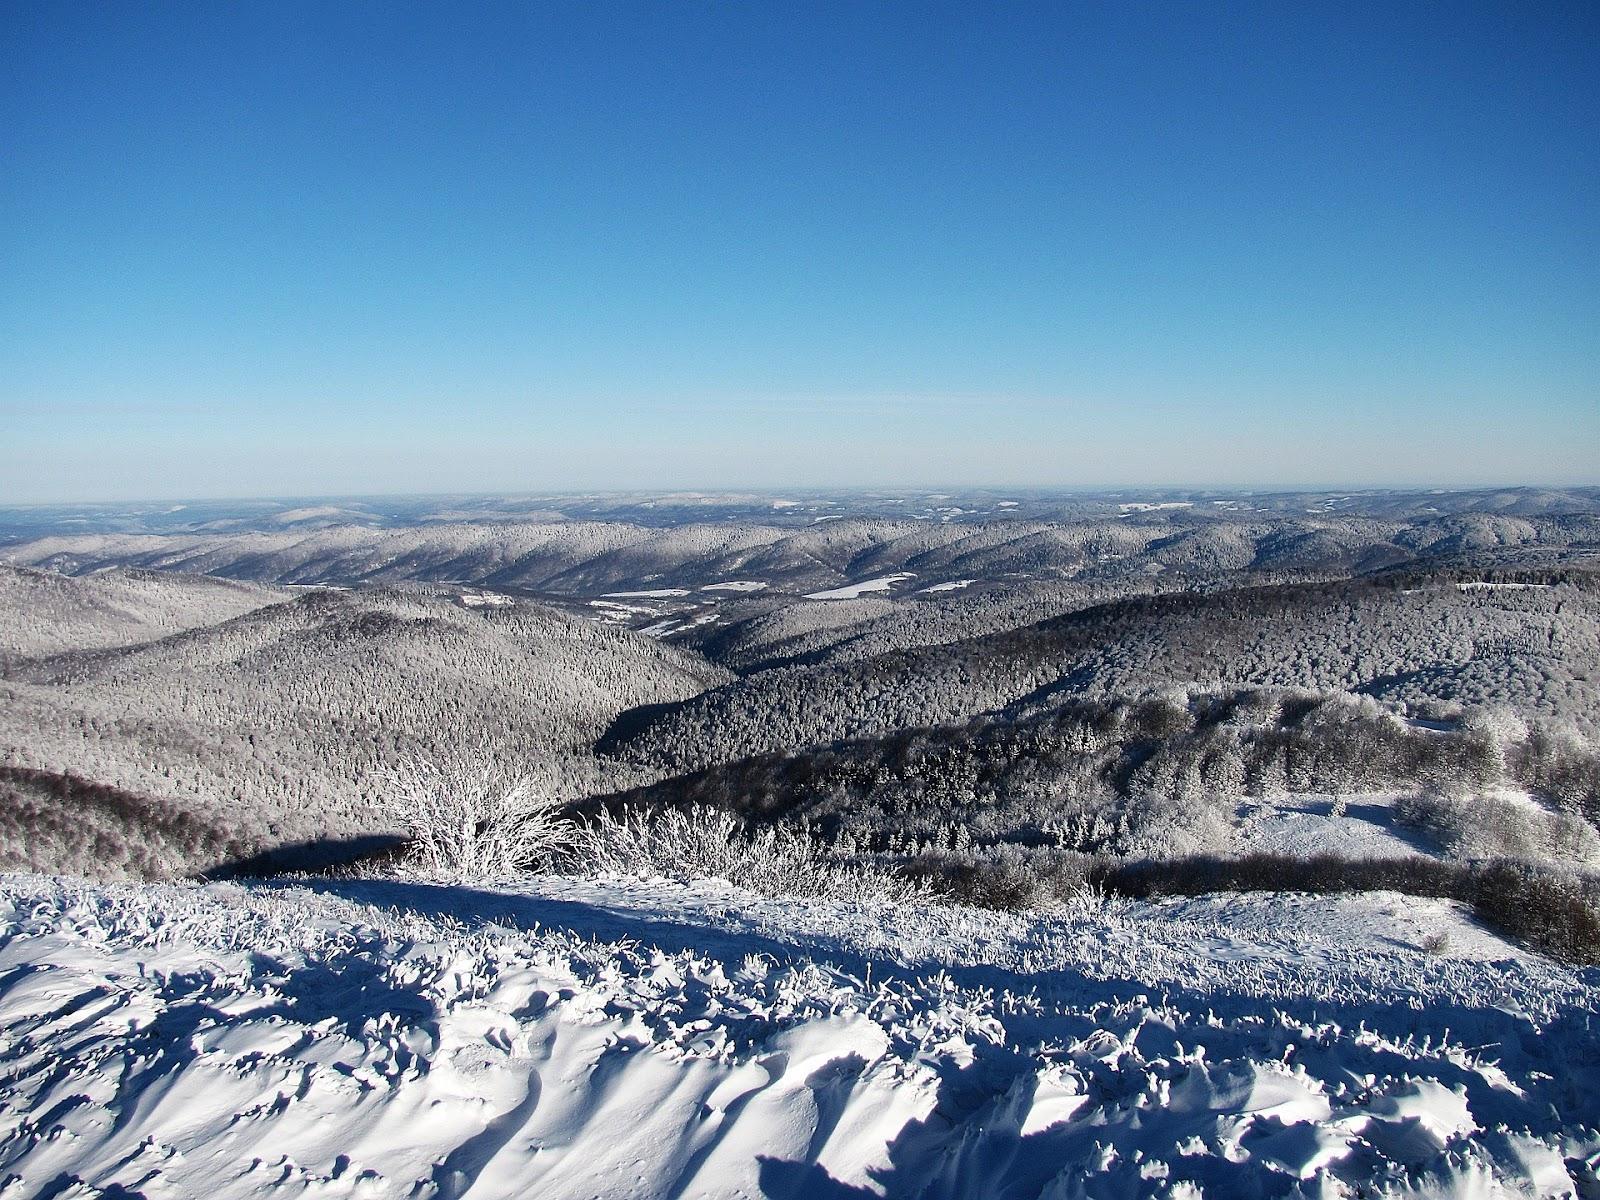 mountains-853449_1920.jpg